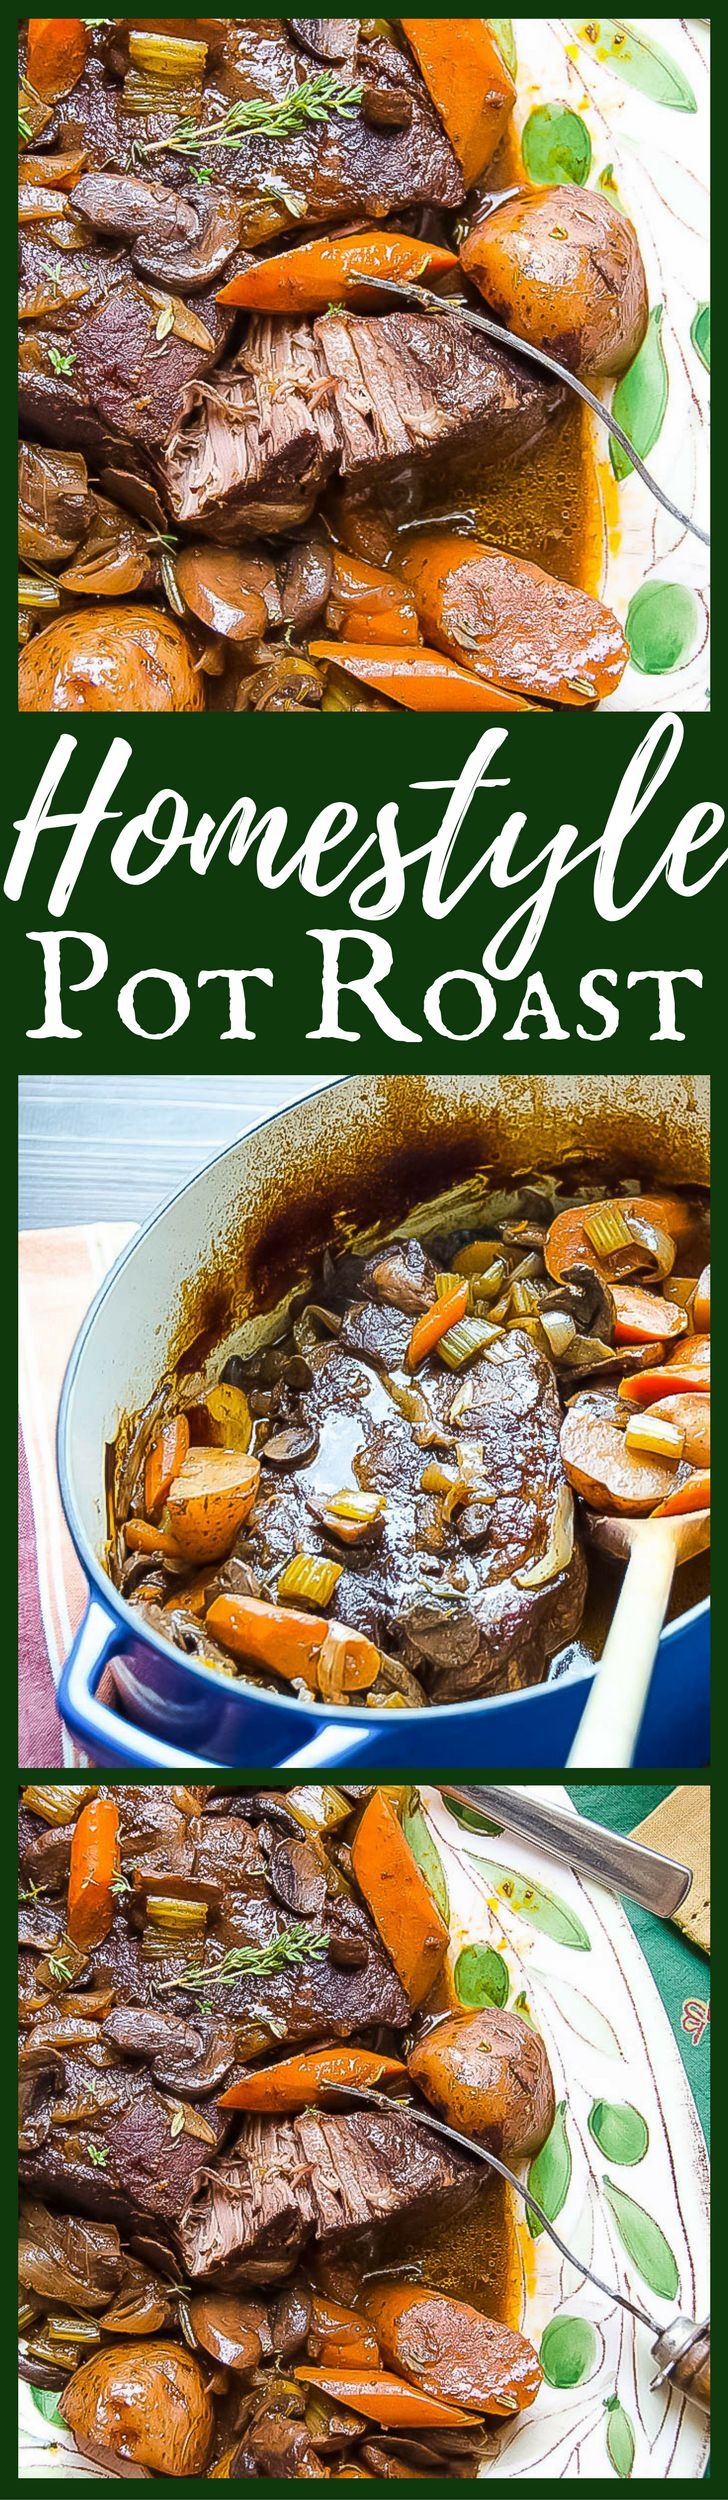 Homestyle Pot Roast | Garlic & Zest